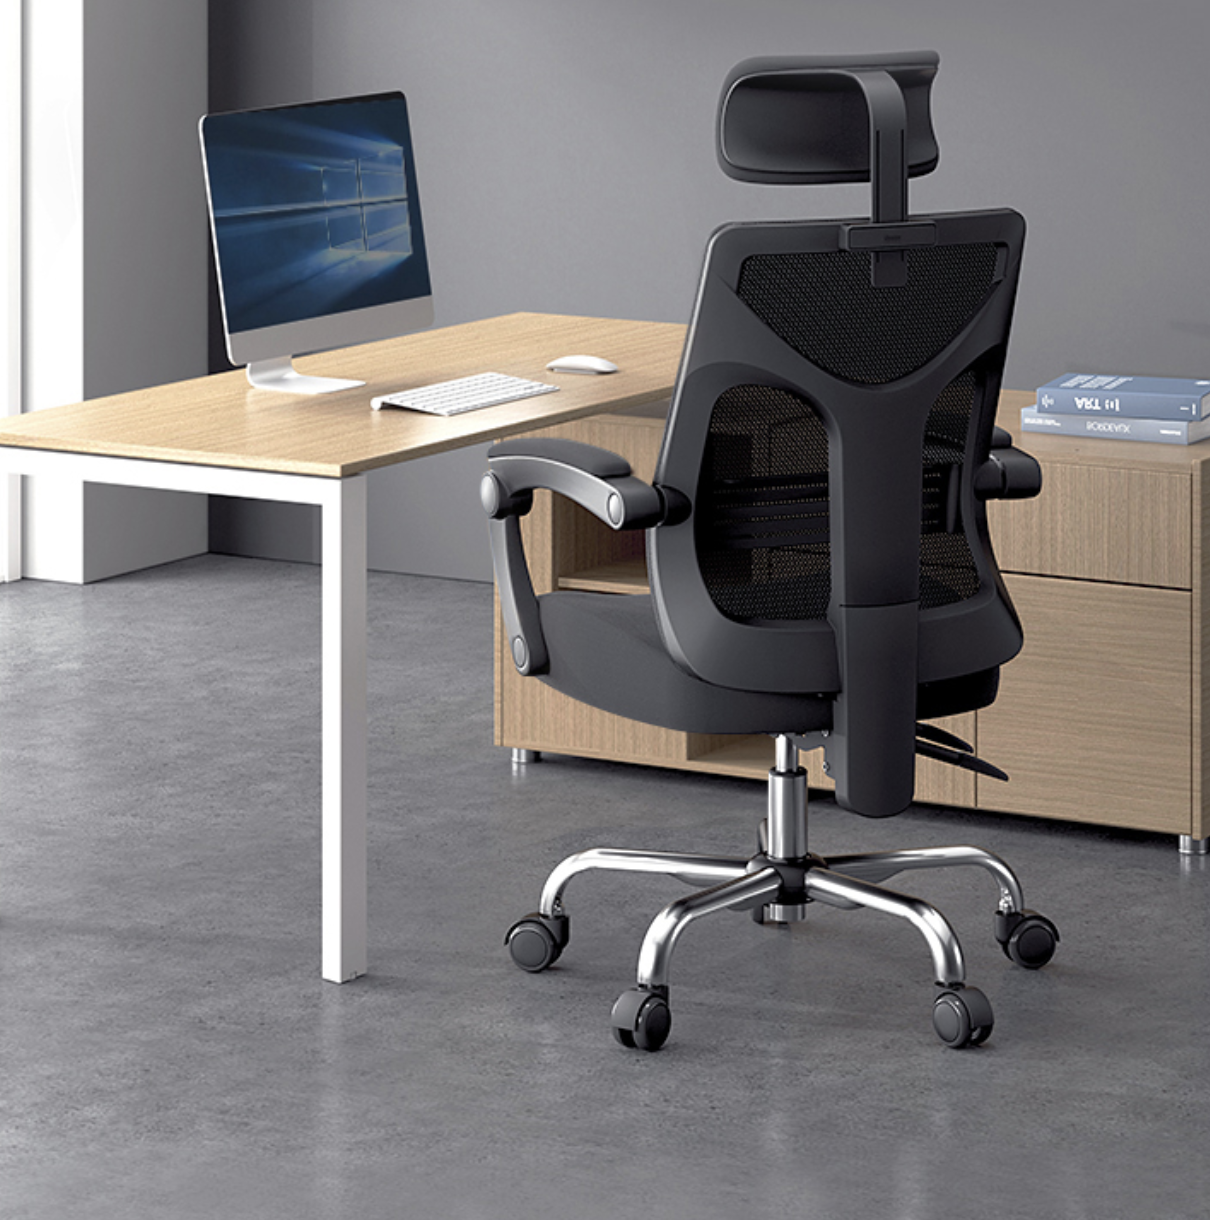 Hbada 黑白调 164BM 人体工学电脑椅 黑色